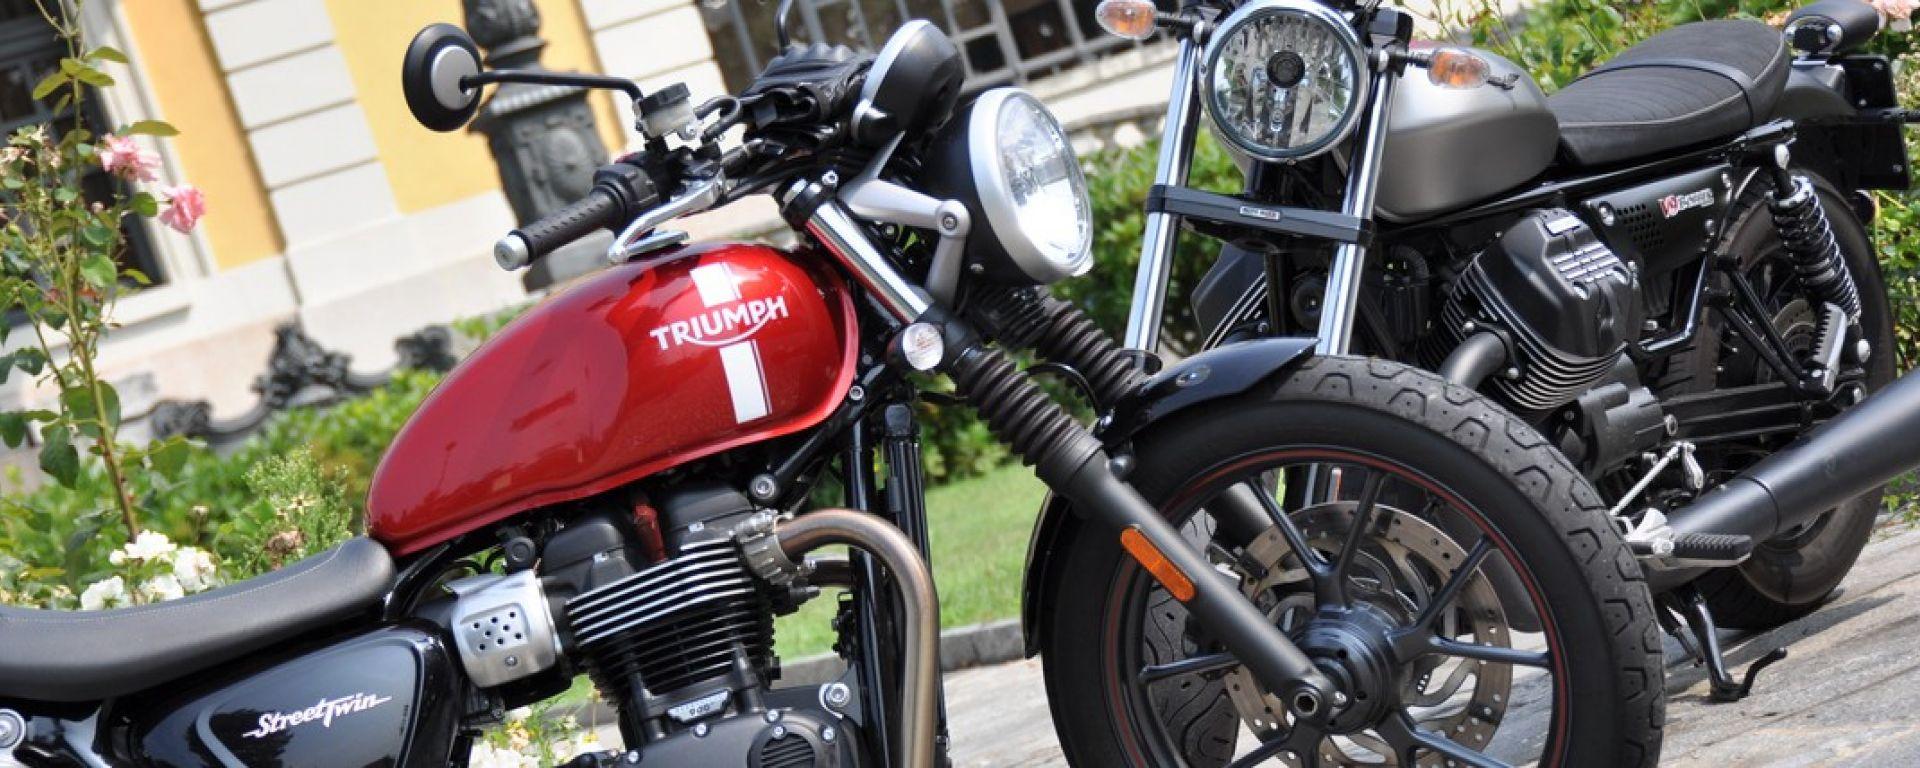 Moto Guzzi V9 Bobber sfida Triumph Street Twin